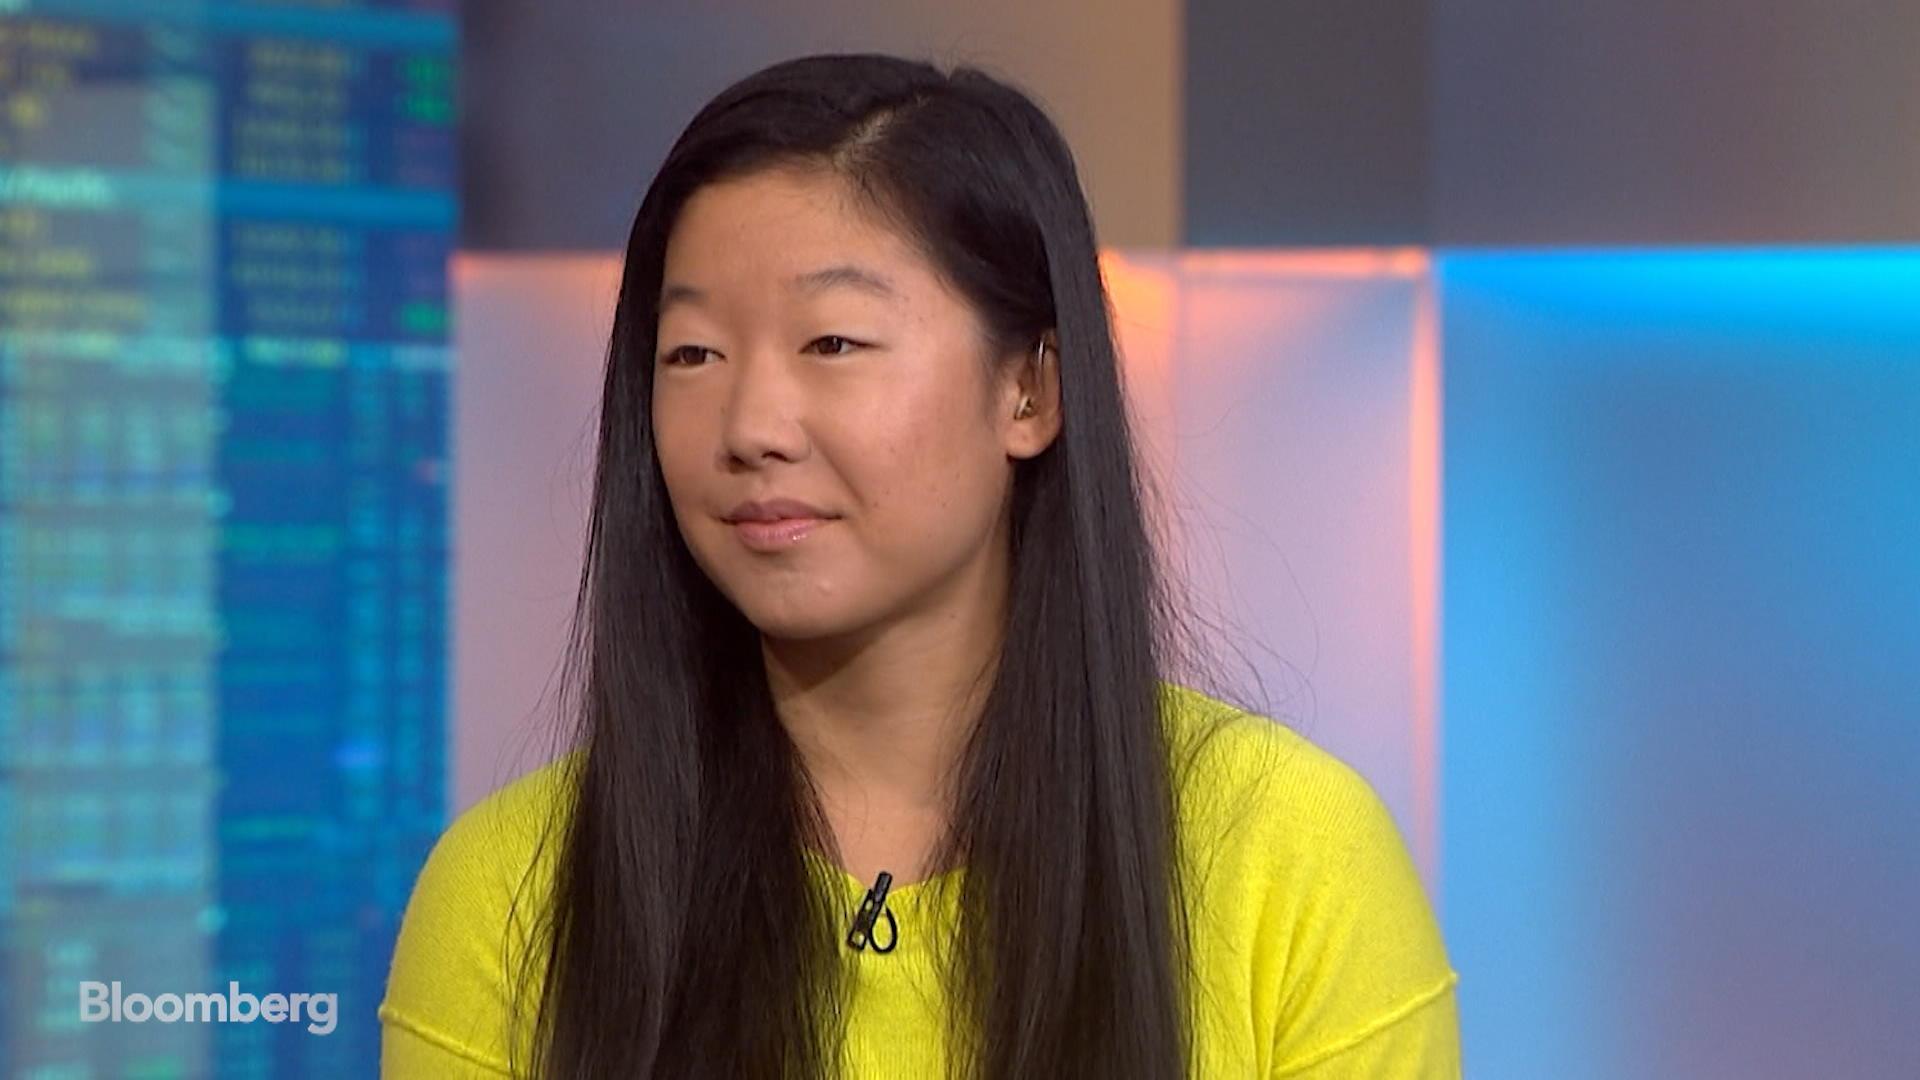 Earnings Sentiment Has Been Positive Says Wells Fargo's Anna Han